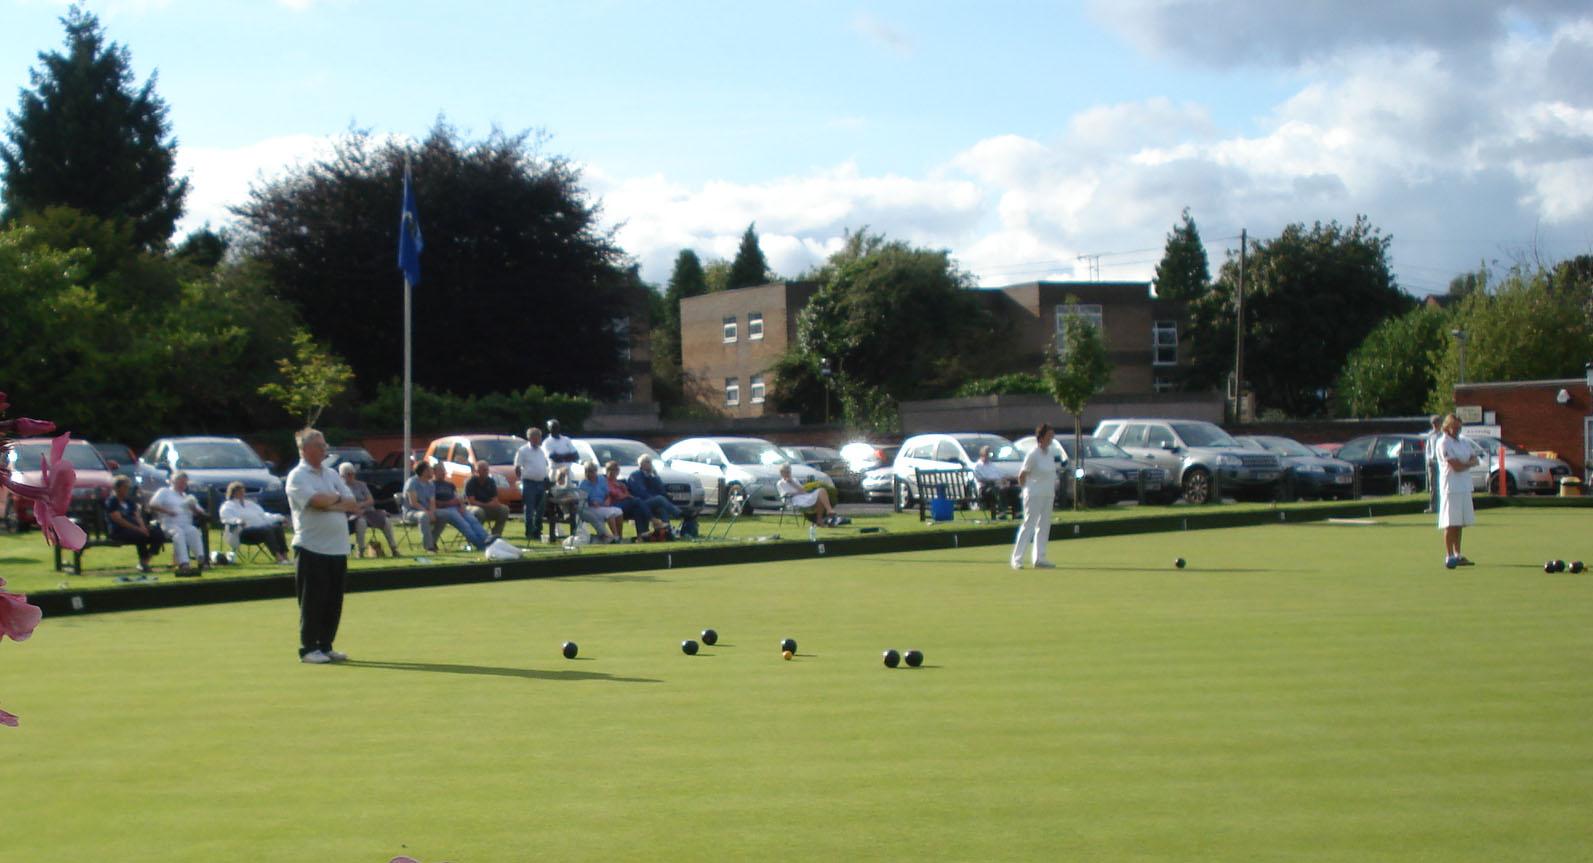 Matches underway with spectators